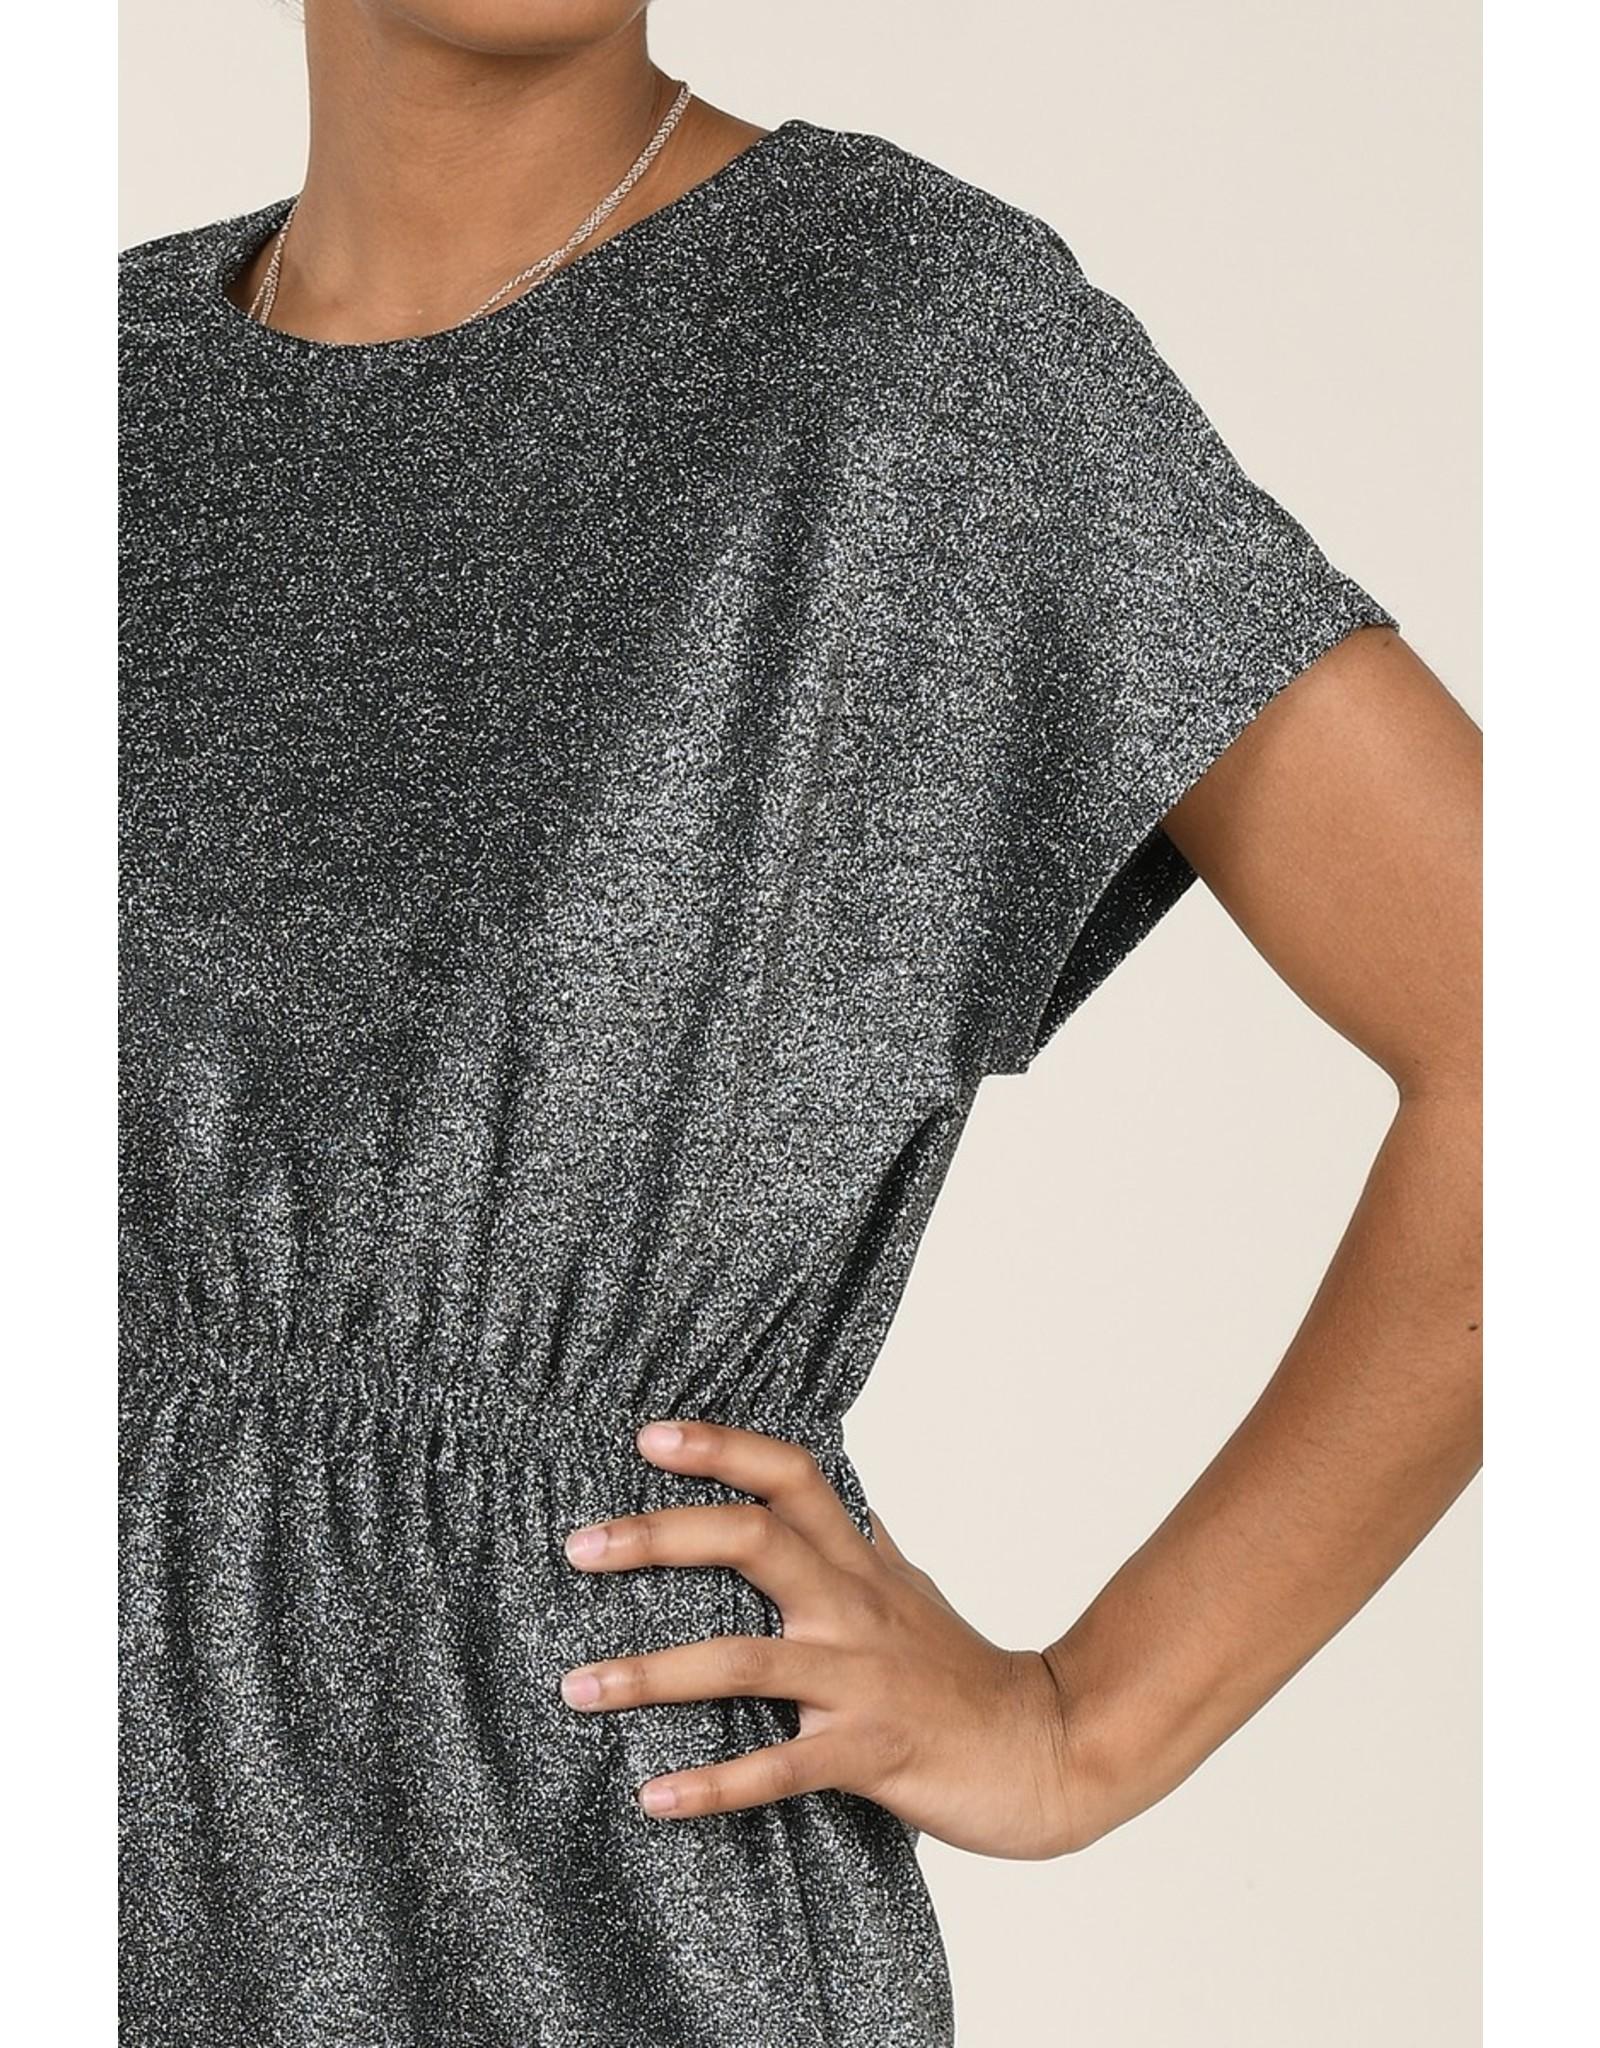 Molly Bracken Molly Bracken - Gunmetal glitter dress with elastic waist